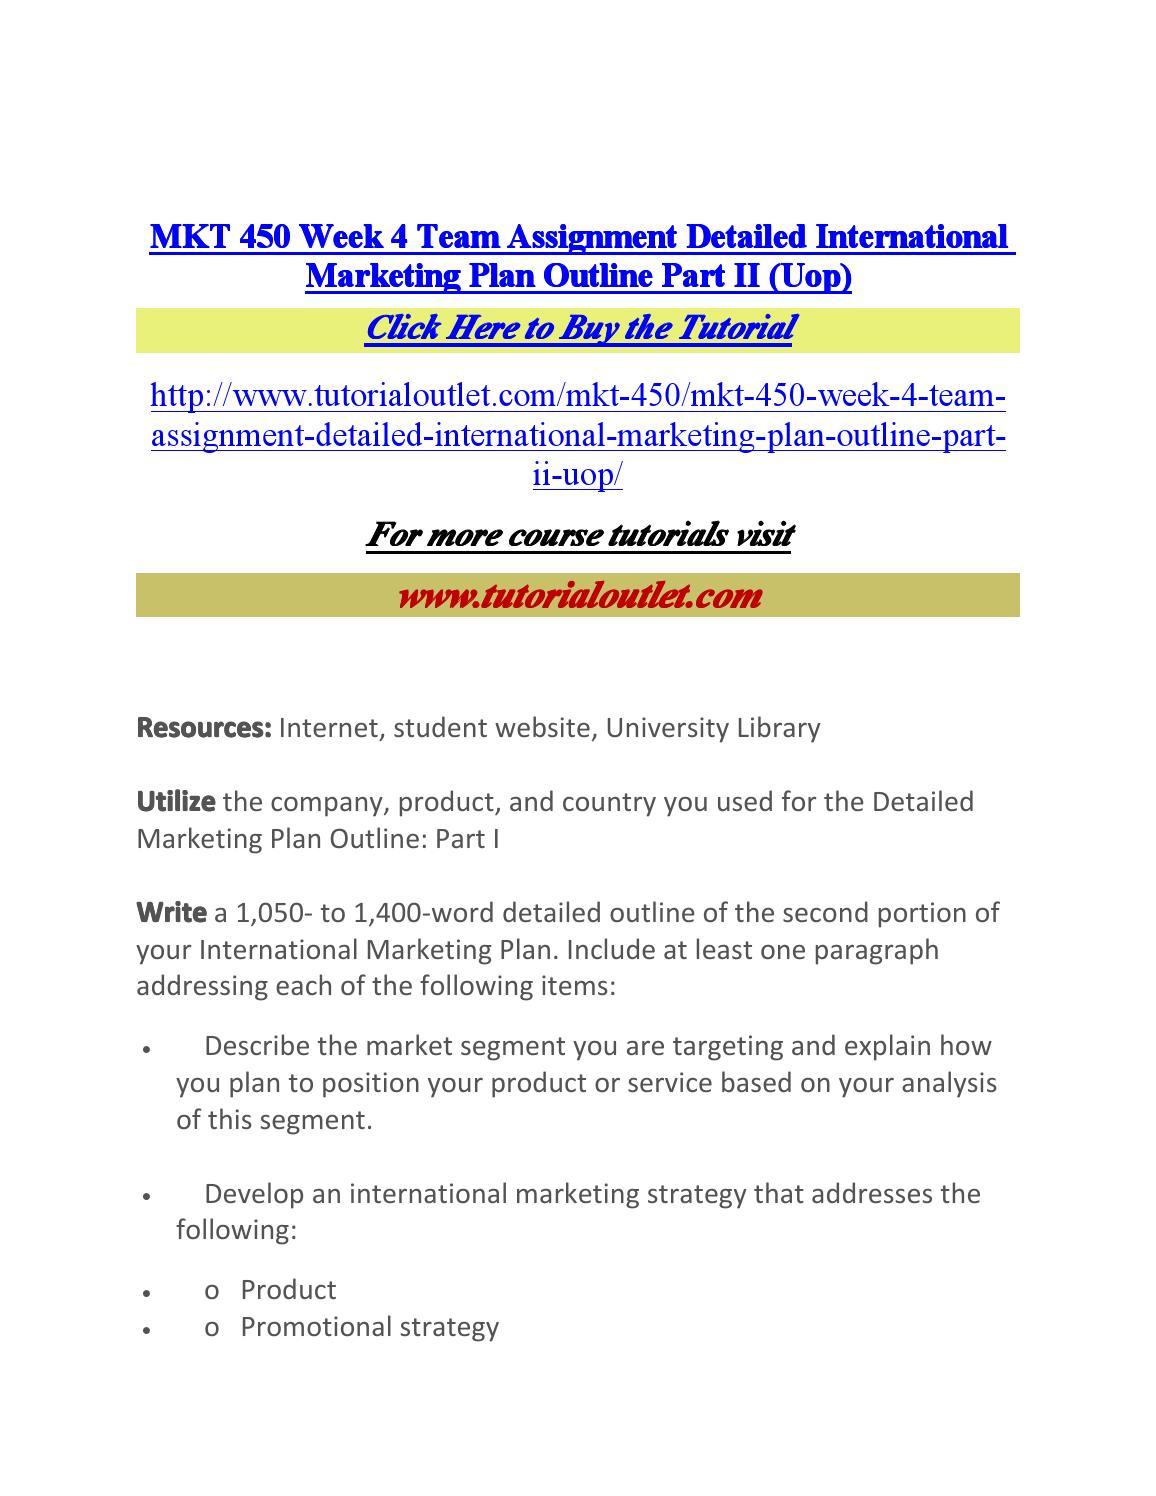 detailed international marketing plan outline ii